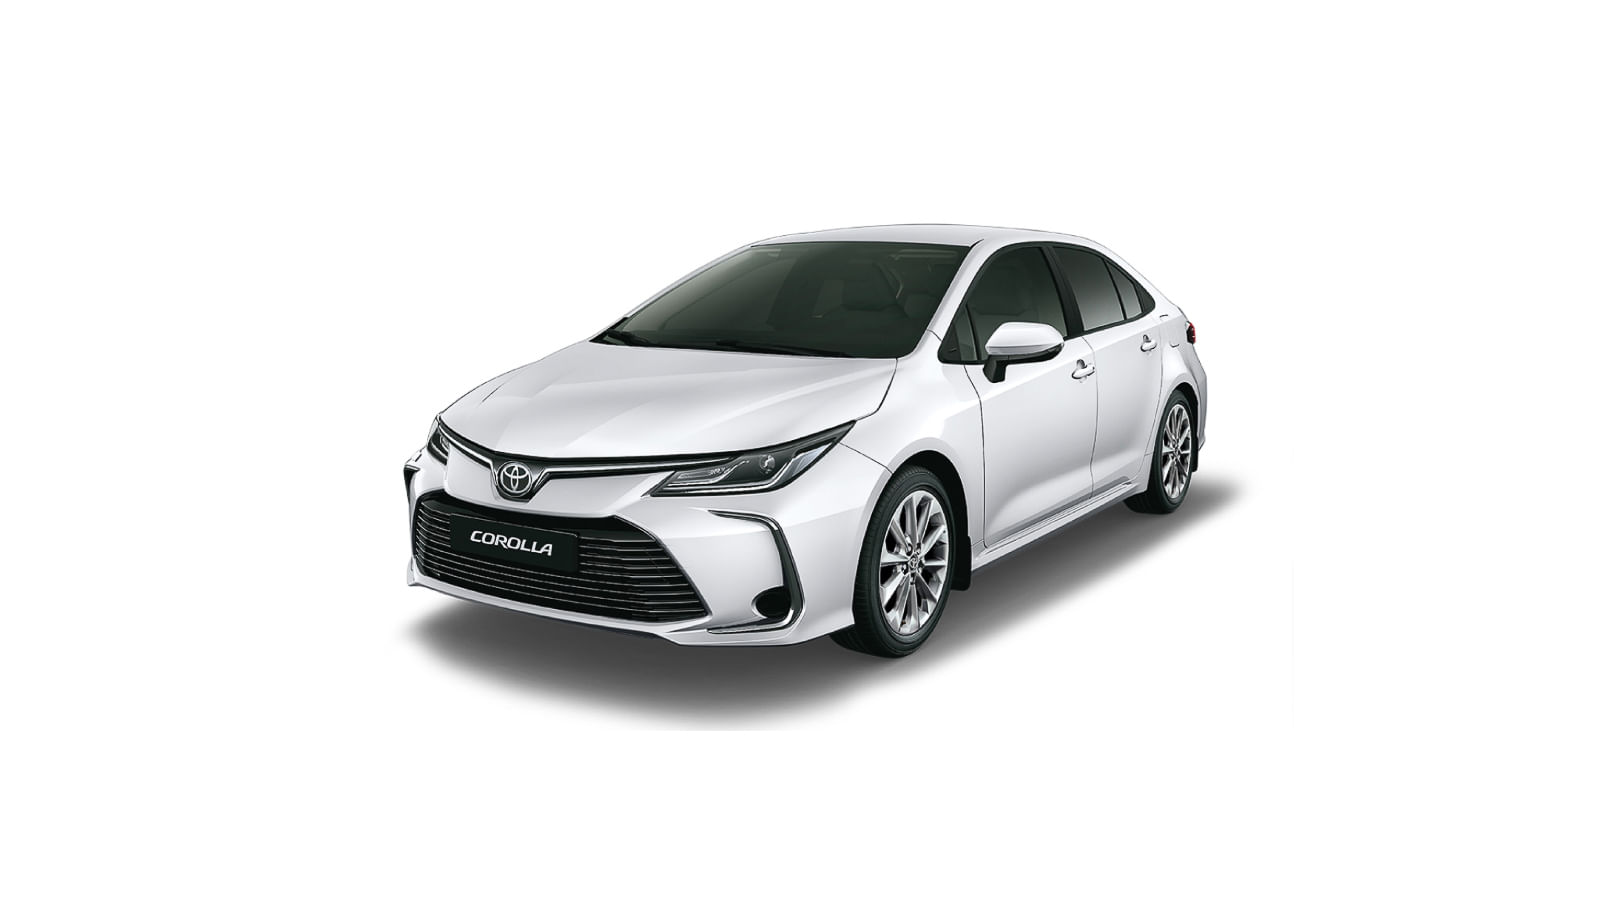 Toyota-Corolla-Xli-MT-02004049-1